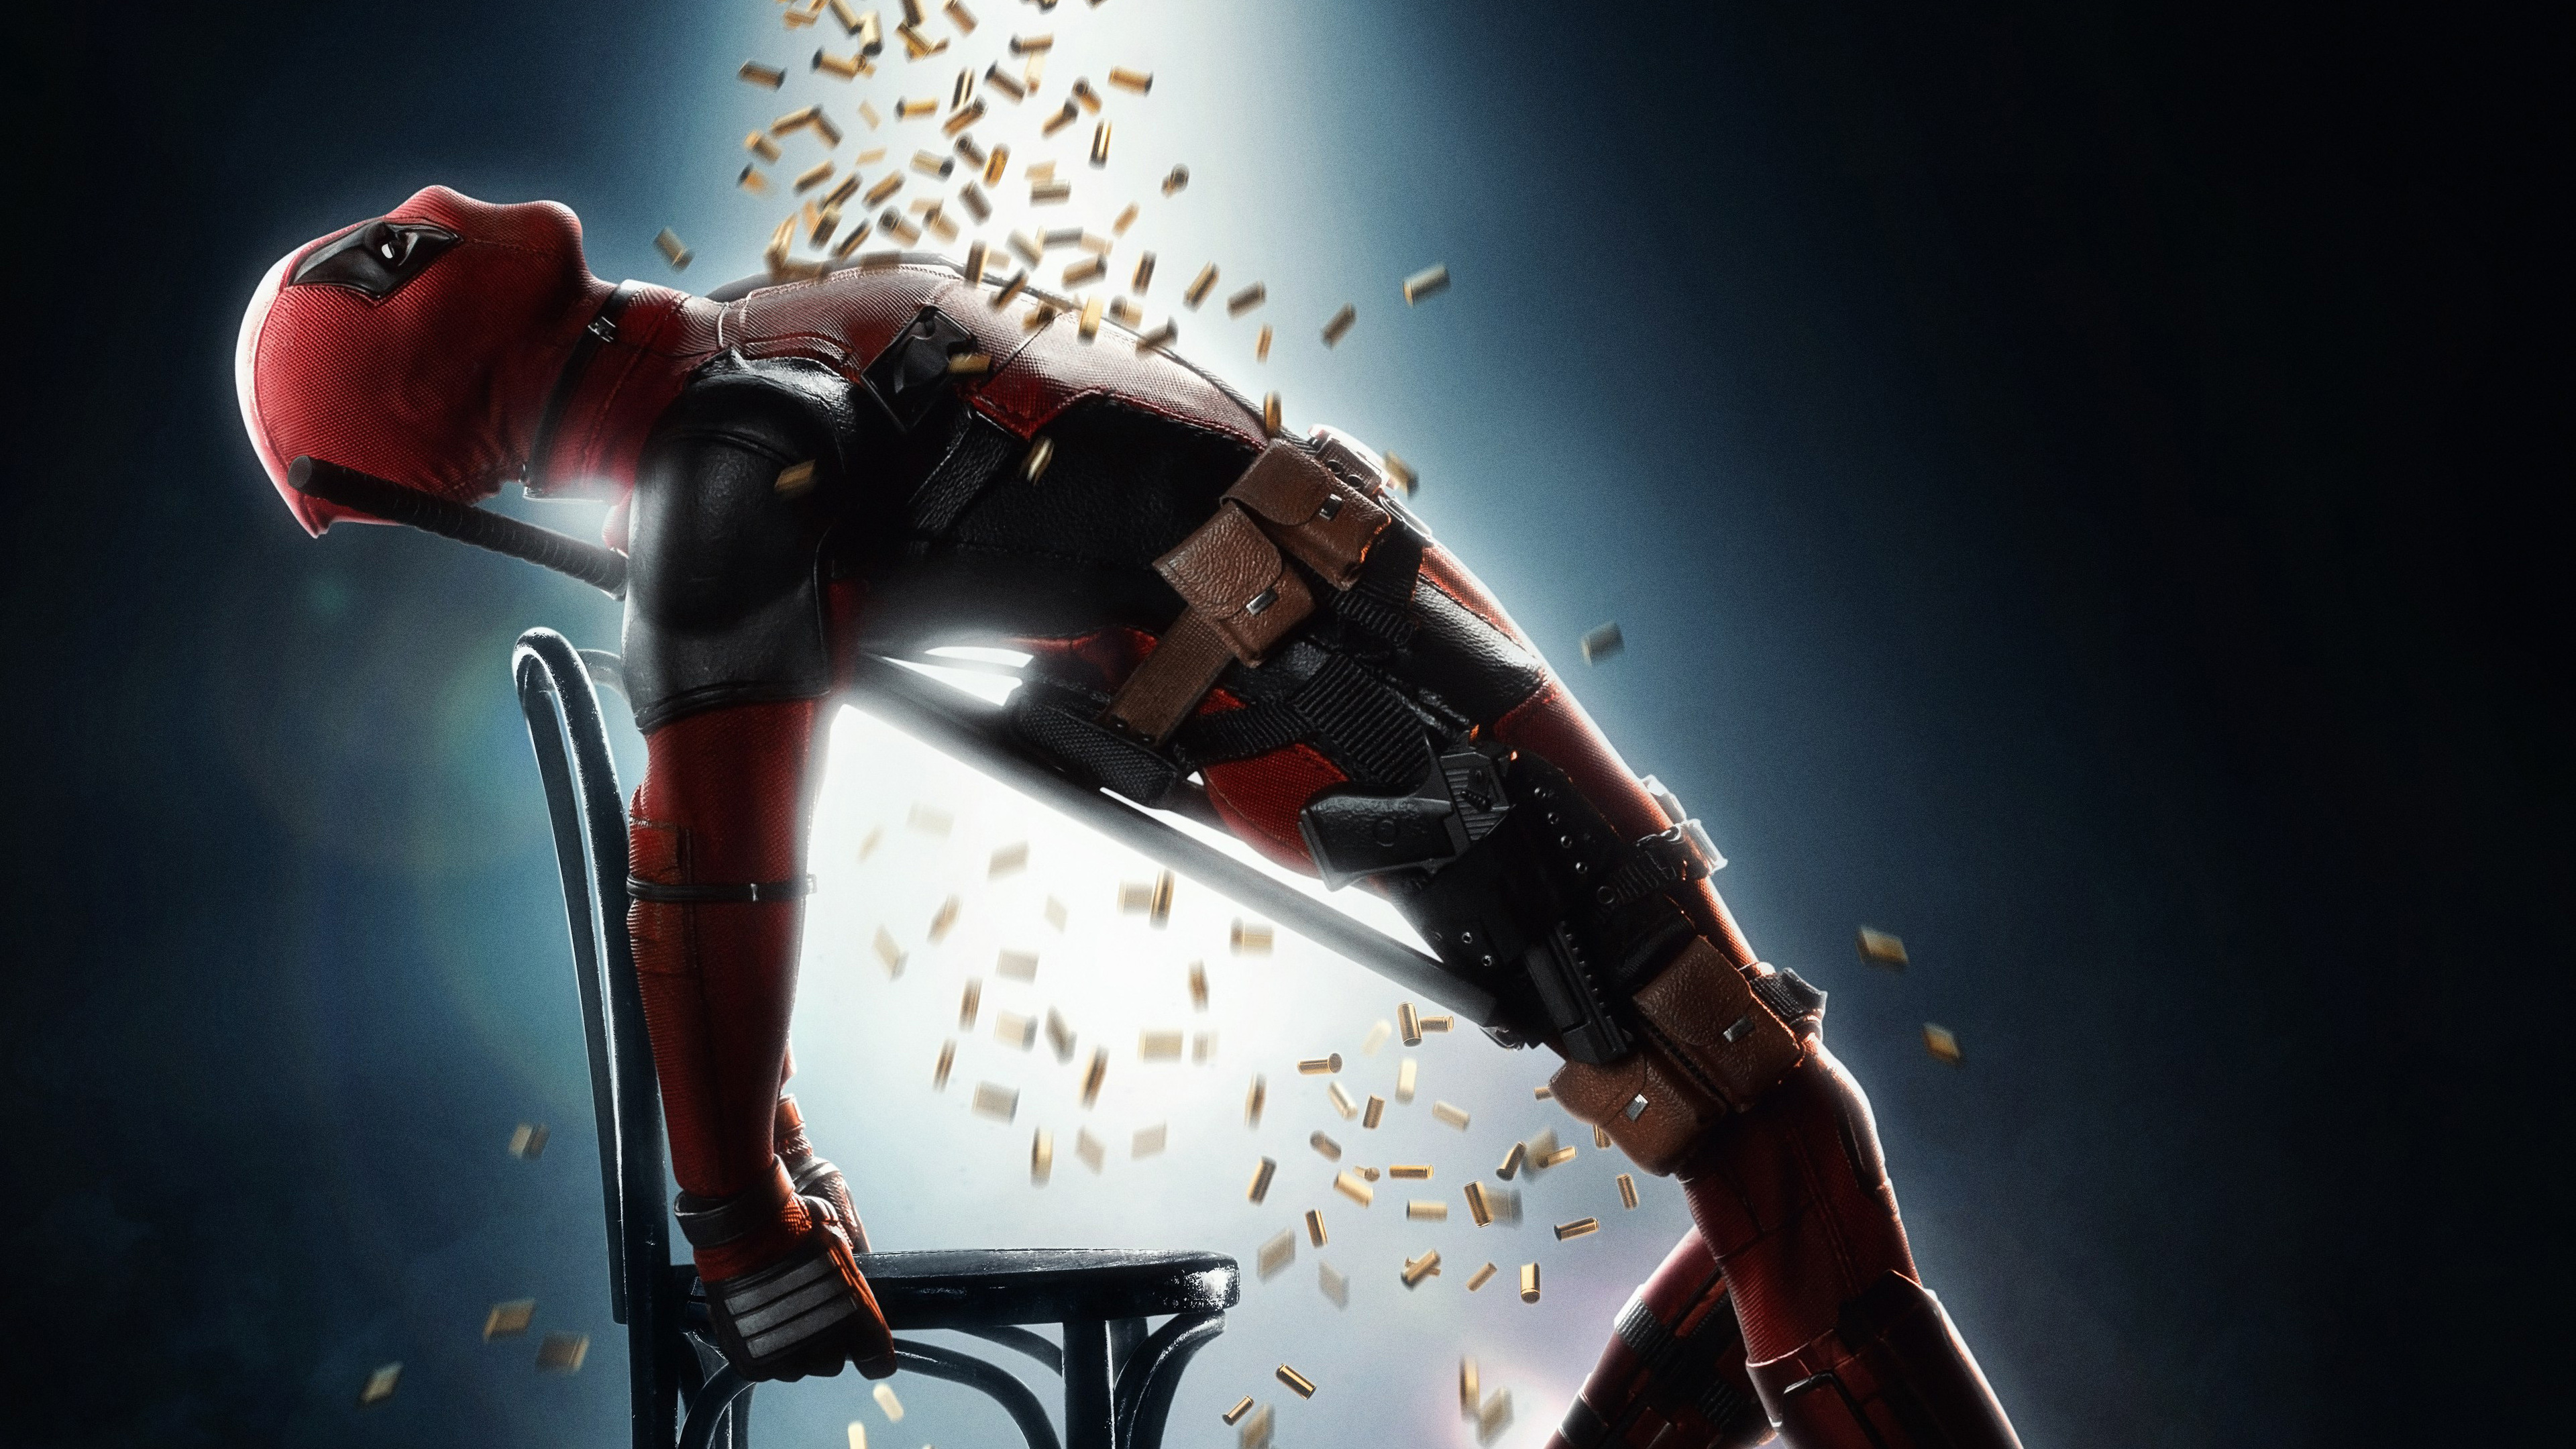 deadpool 4k 2018 1537645982 - Deadpool 4k 2018 - superheroes wallpapers, hd-wallpapers, deadpool wallpapers, 4k-wallpapers